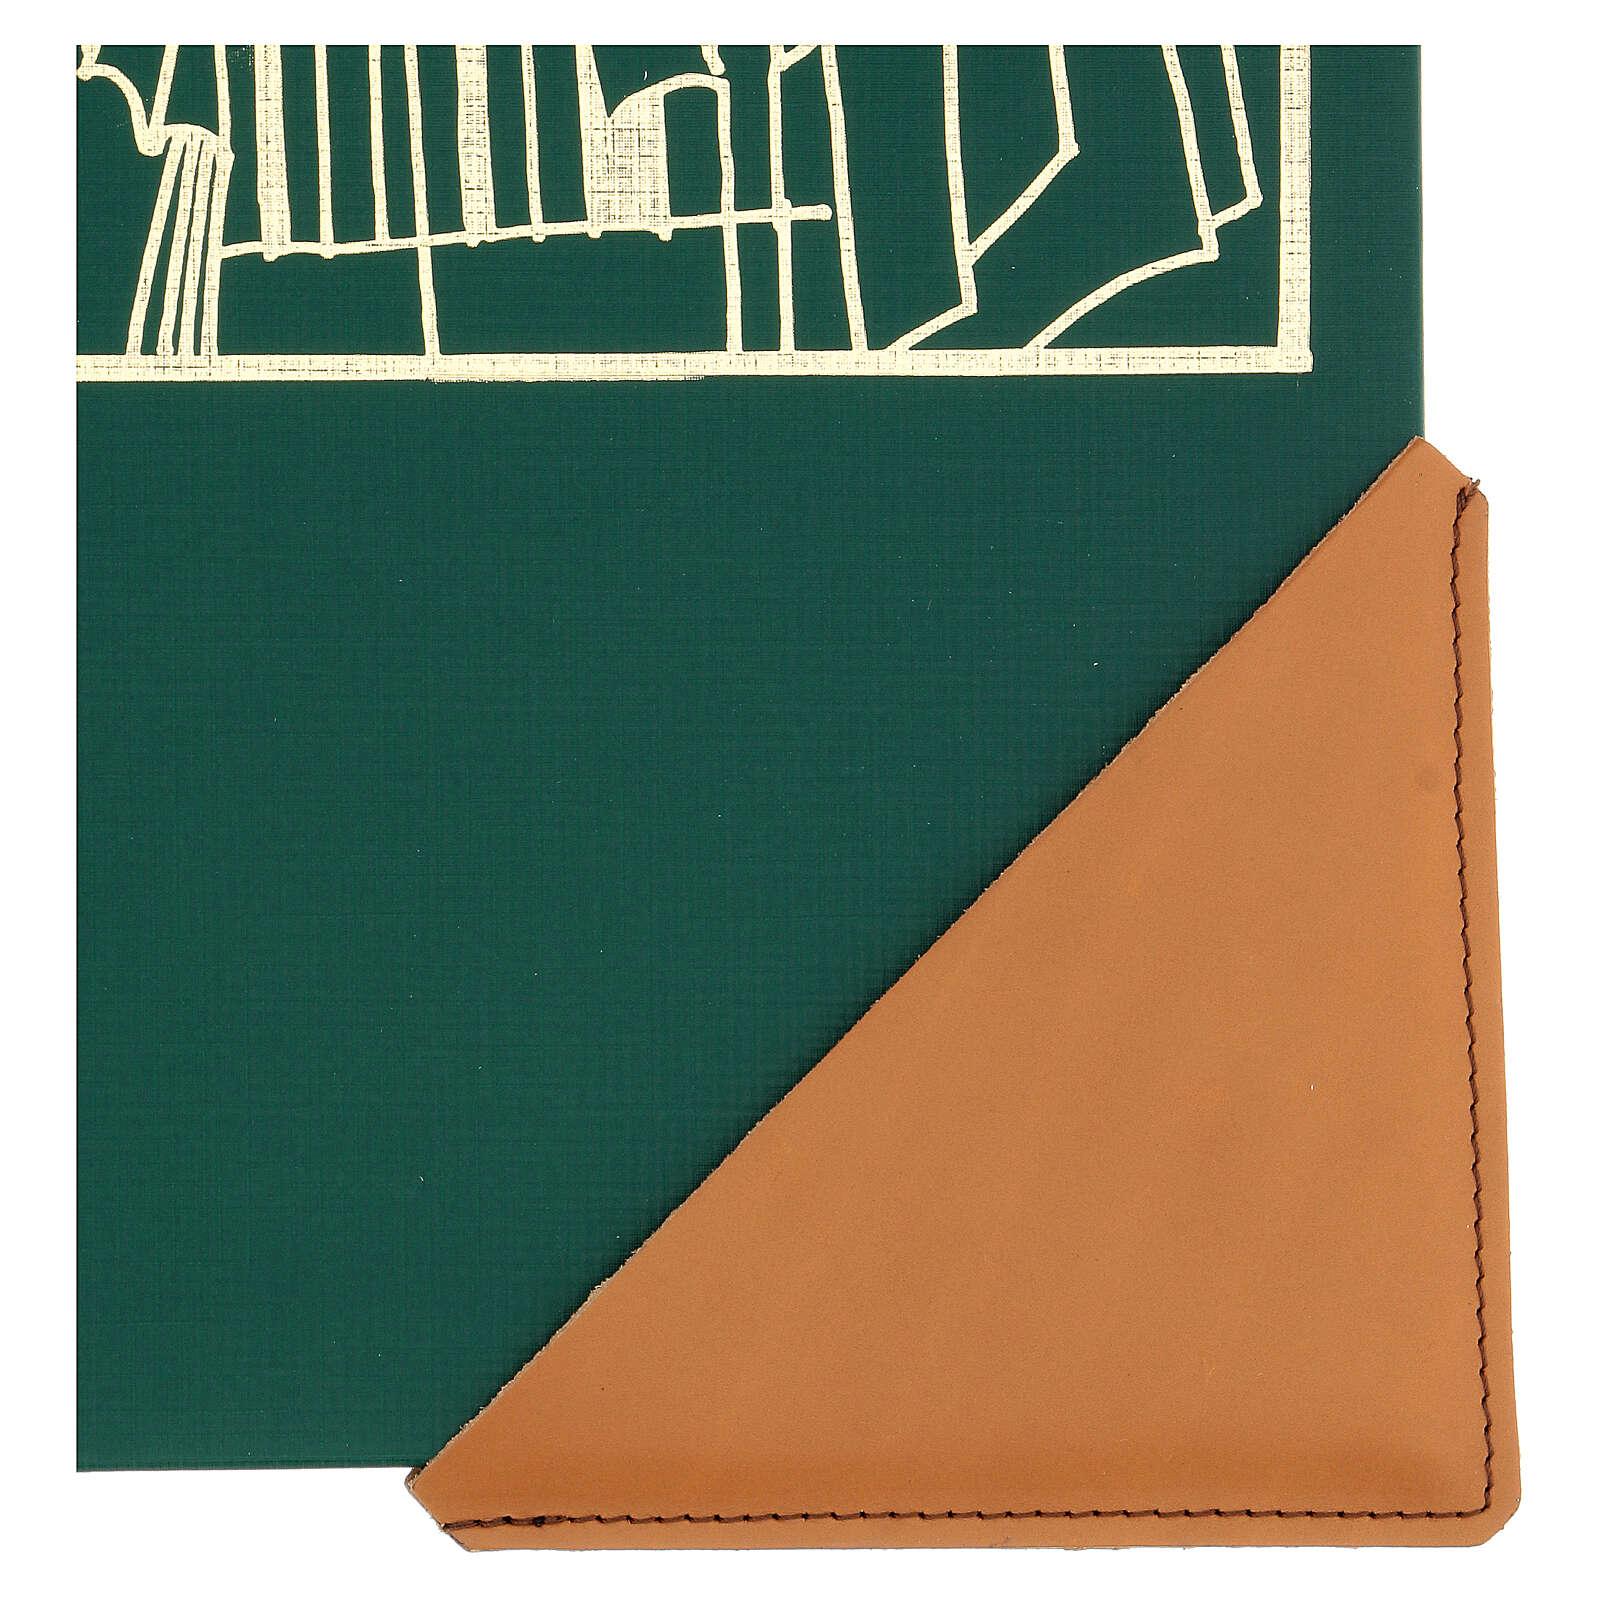 Cognac leather corner protector for liturgical books 12 cm 2 pcs 4